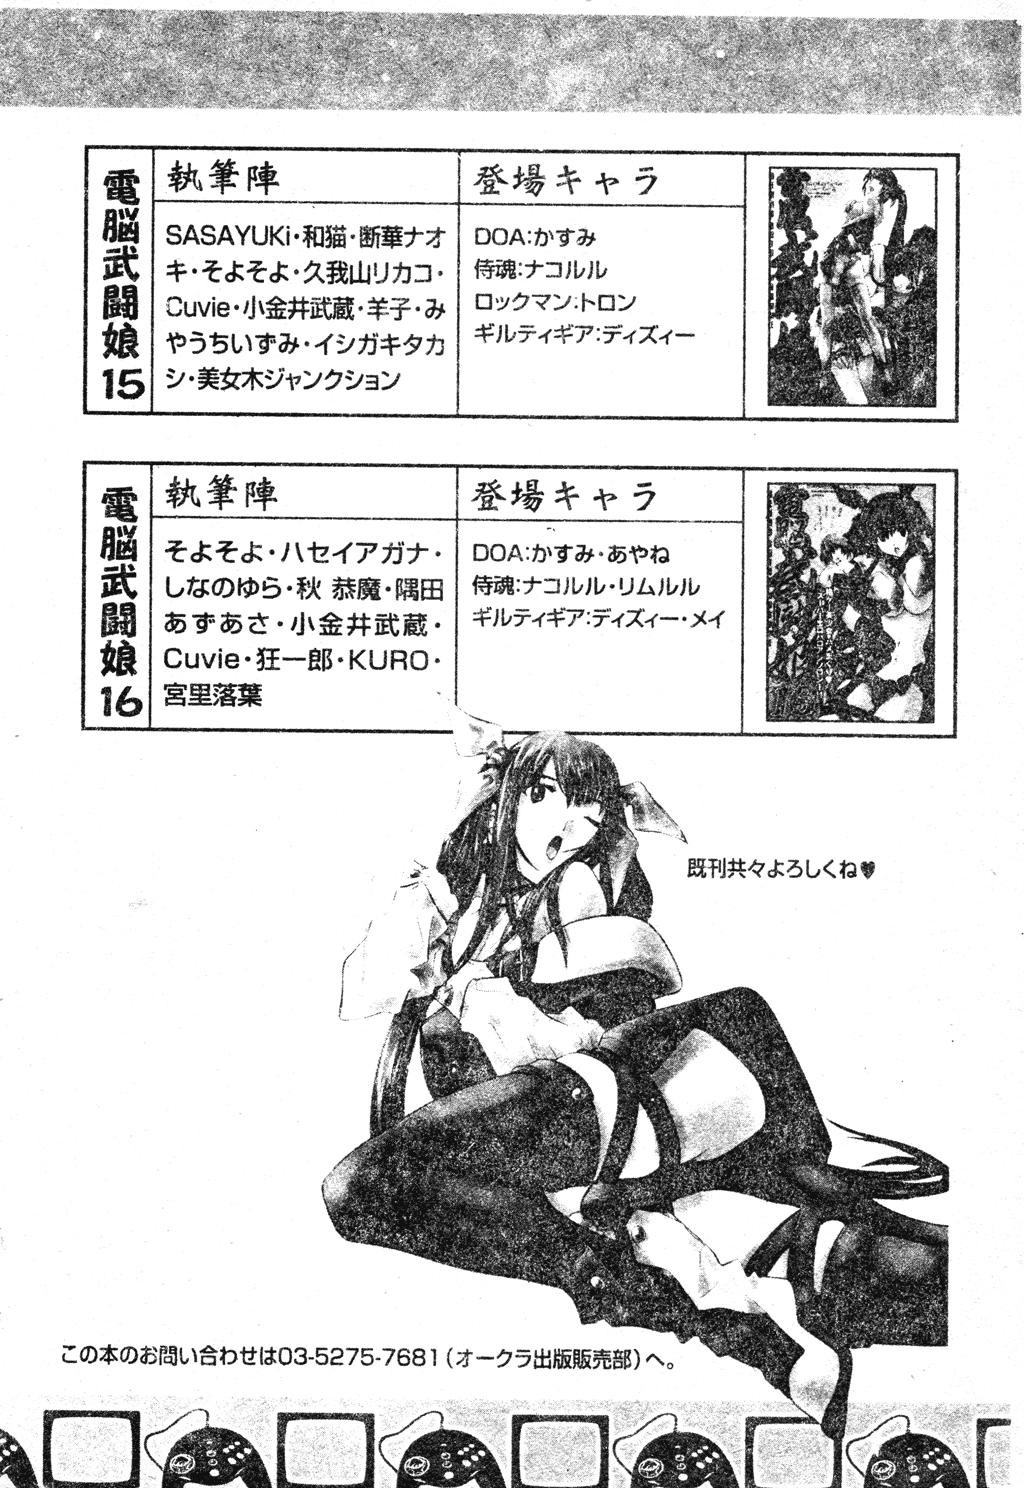 DenNow Koihime Collection 7 186